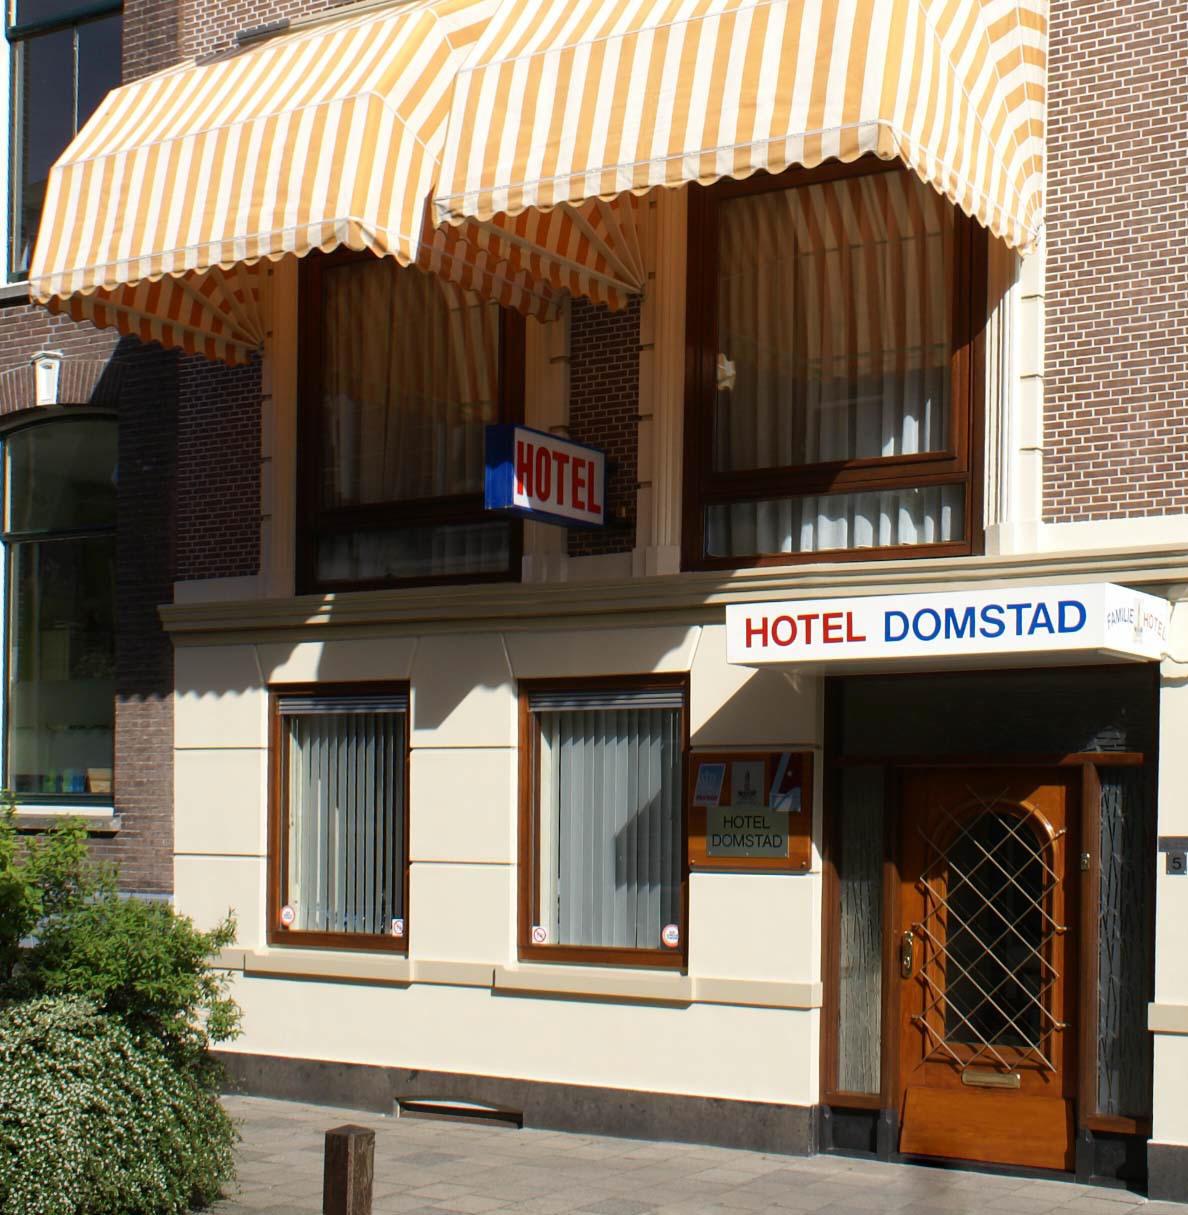 hoteldomstad-entree